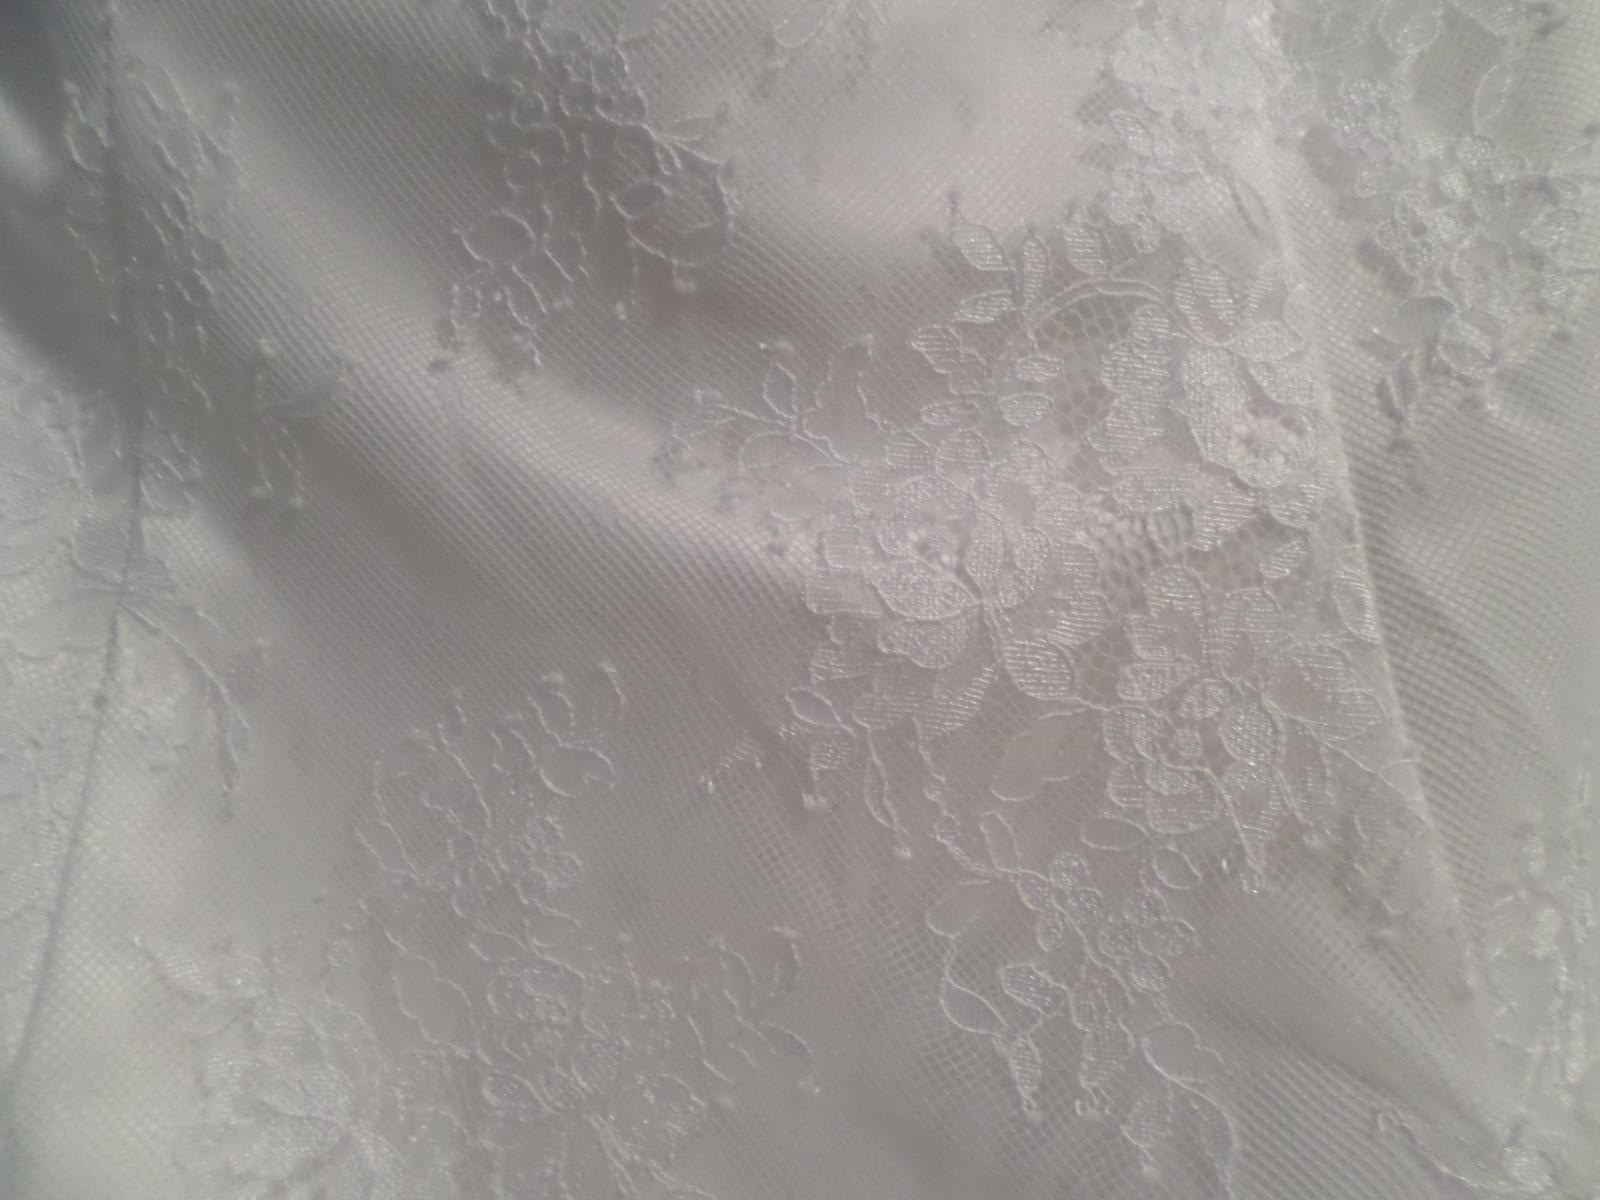 Krajkové krátke svadobné šaty - Obrázok č. 3